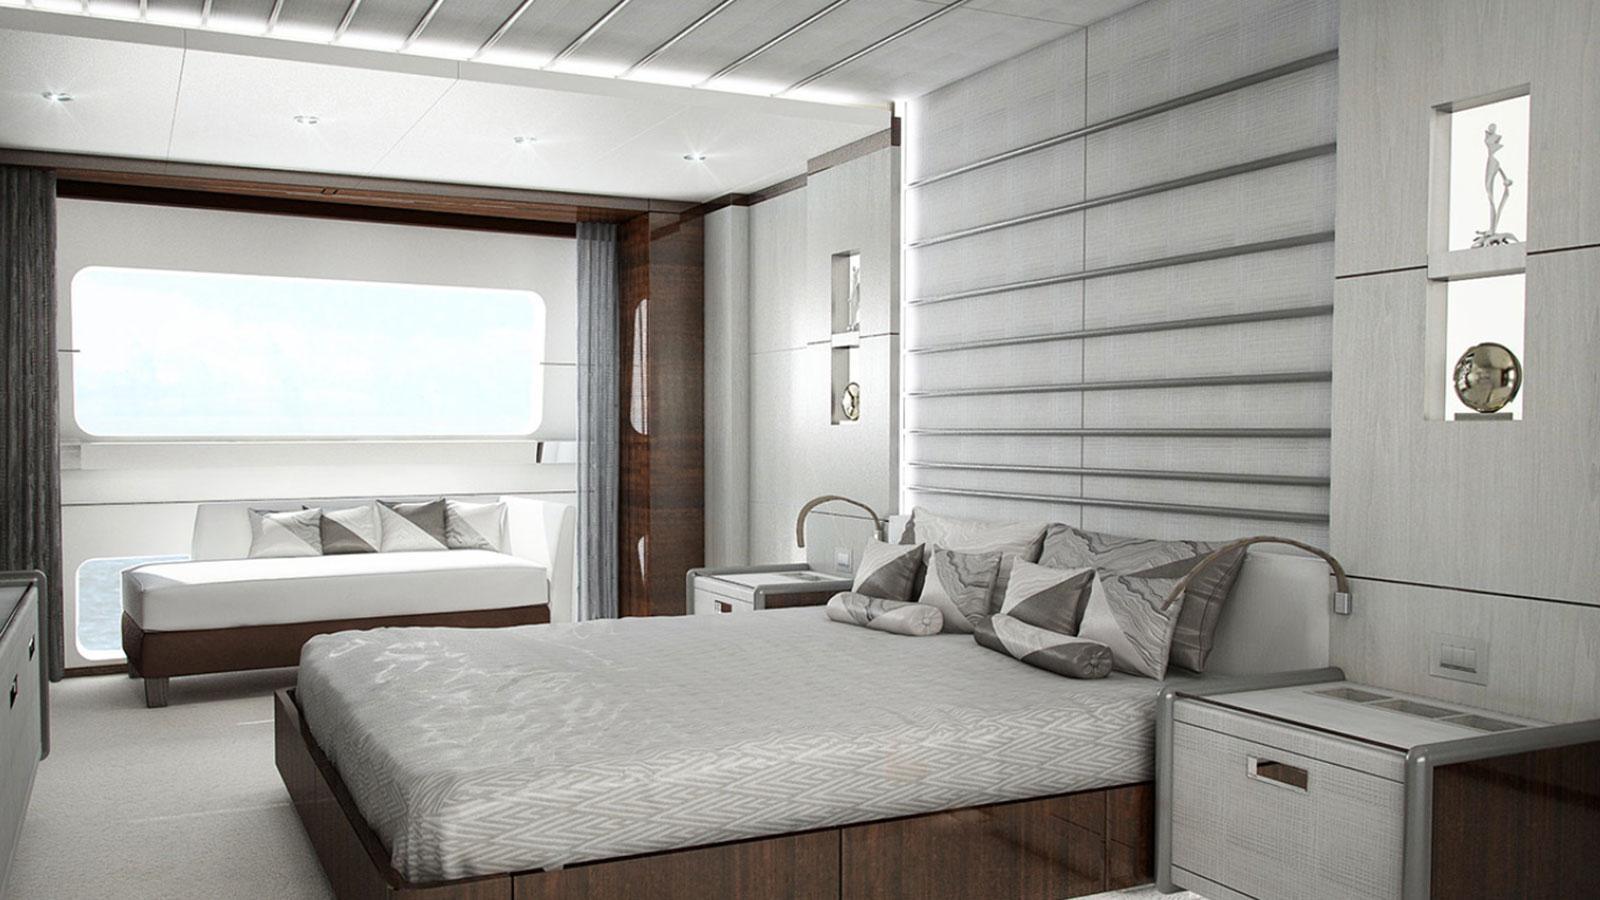 supreme 132 bs011 motoryacht benetti yachts 40m 2019 master sistership